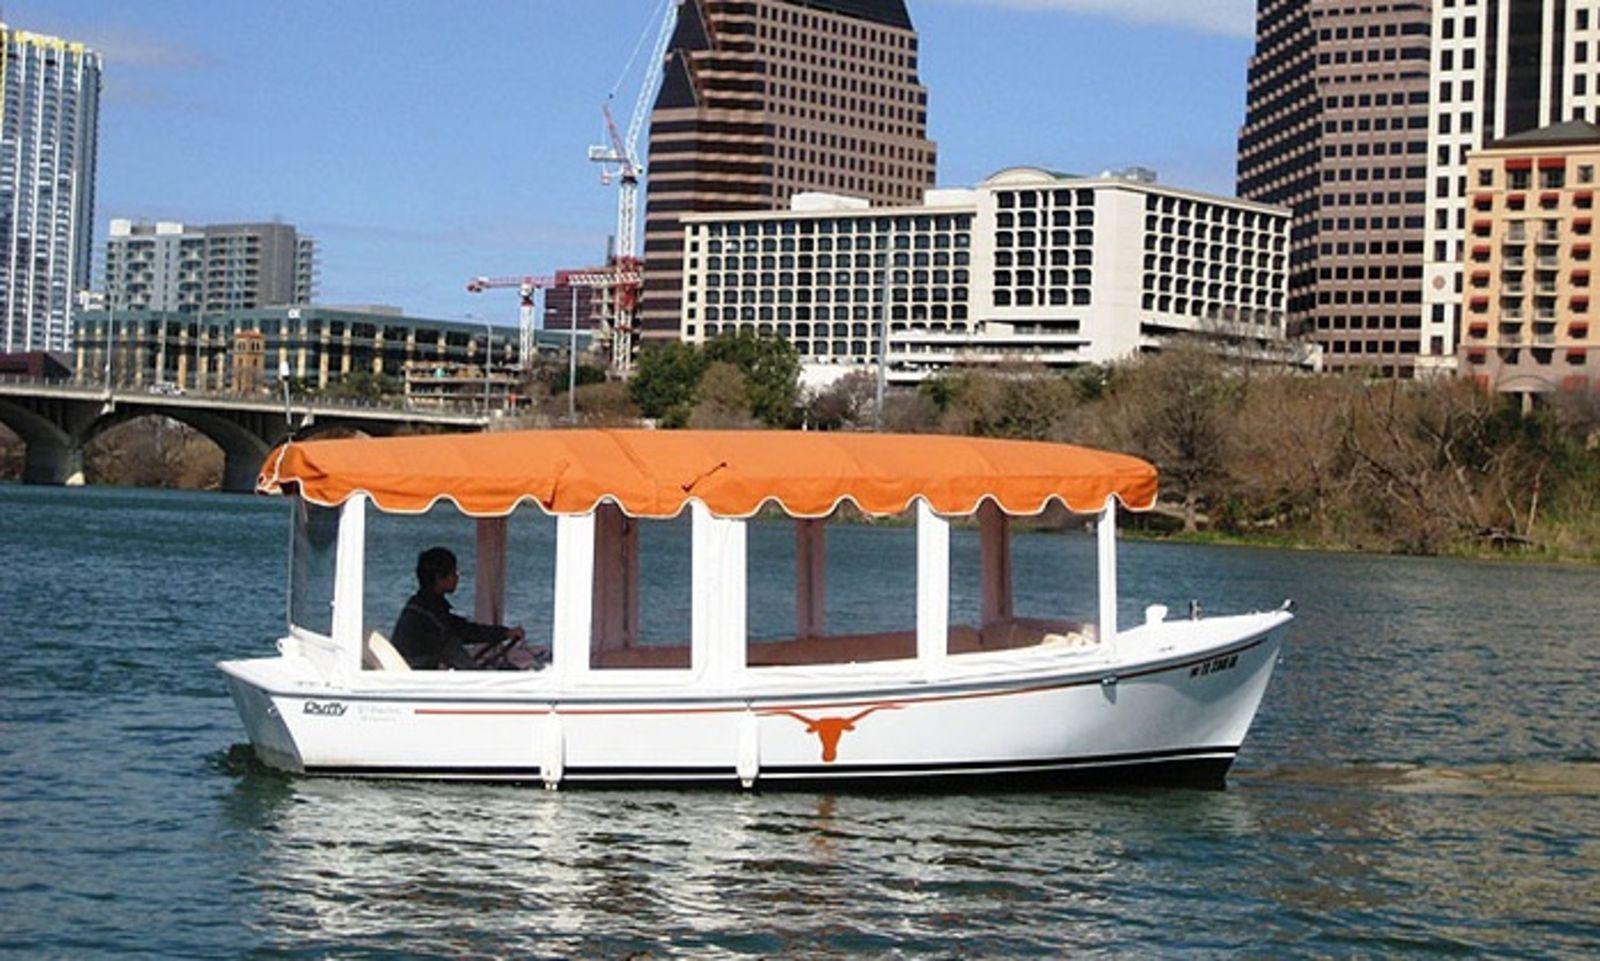 21 Duffy Electric Boat Rental In Austin In Austin Boat Rental Lady Bird Lake Boat